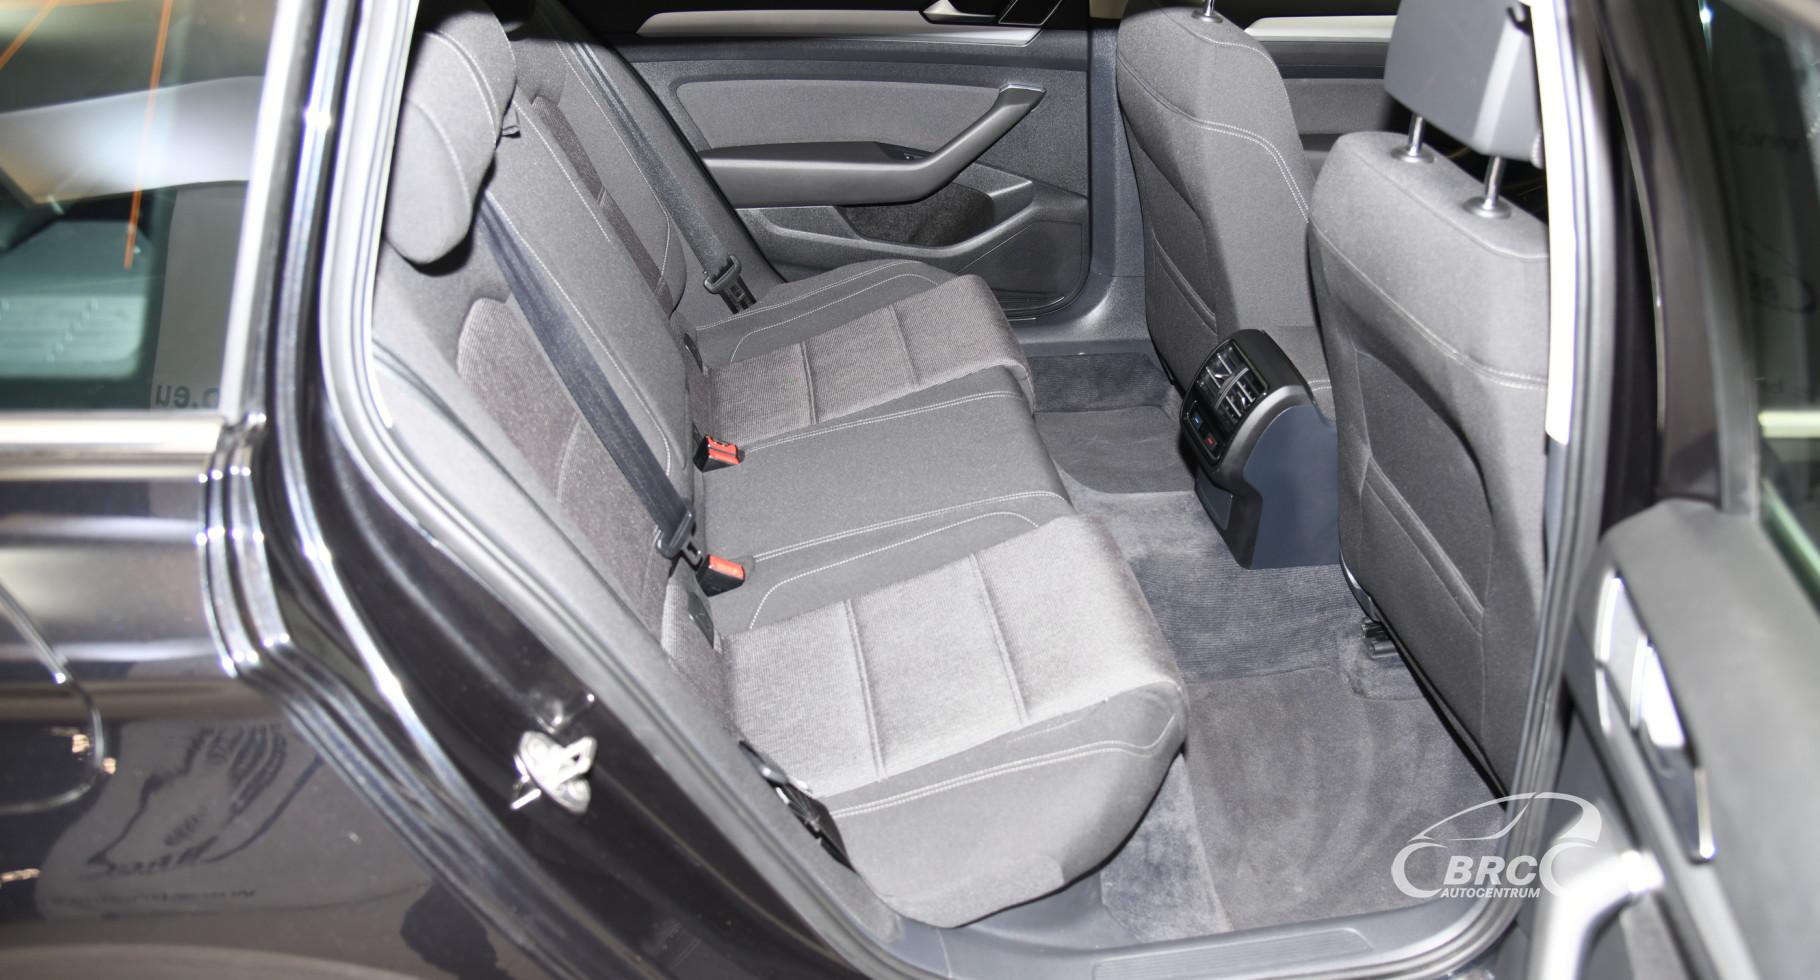 Volkswagen Passat 2.0 TDI BlueMotion Variant